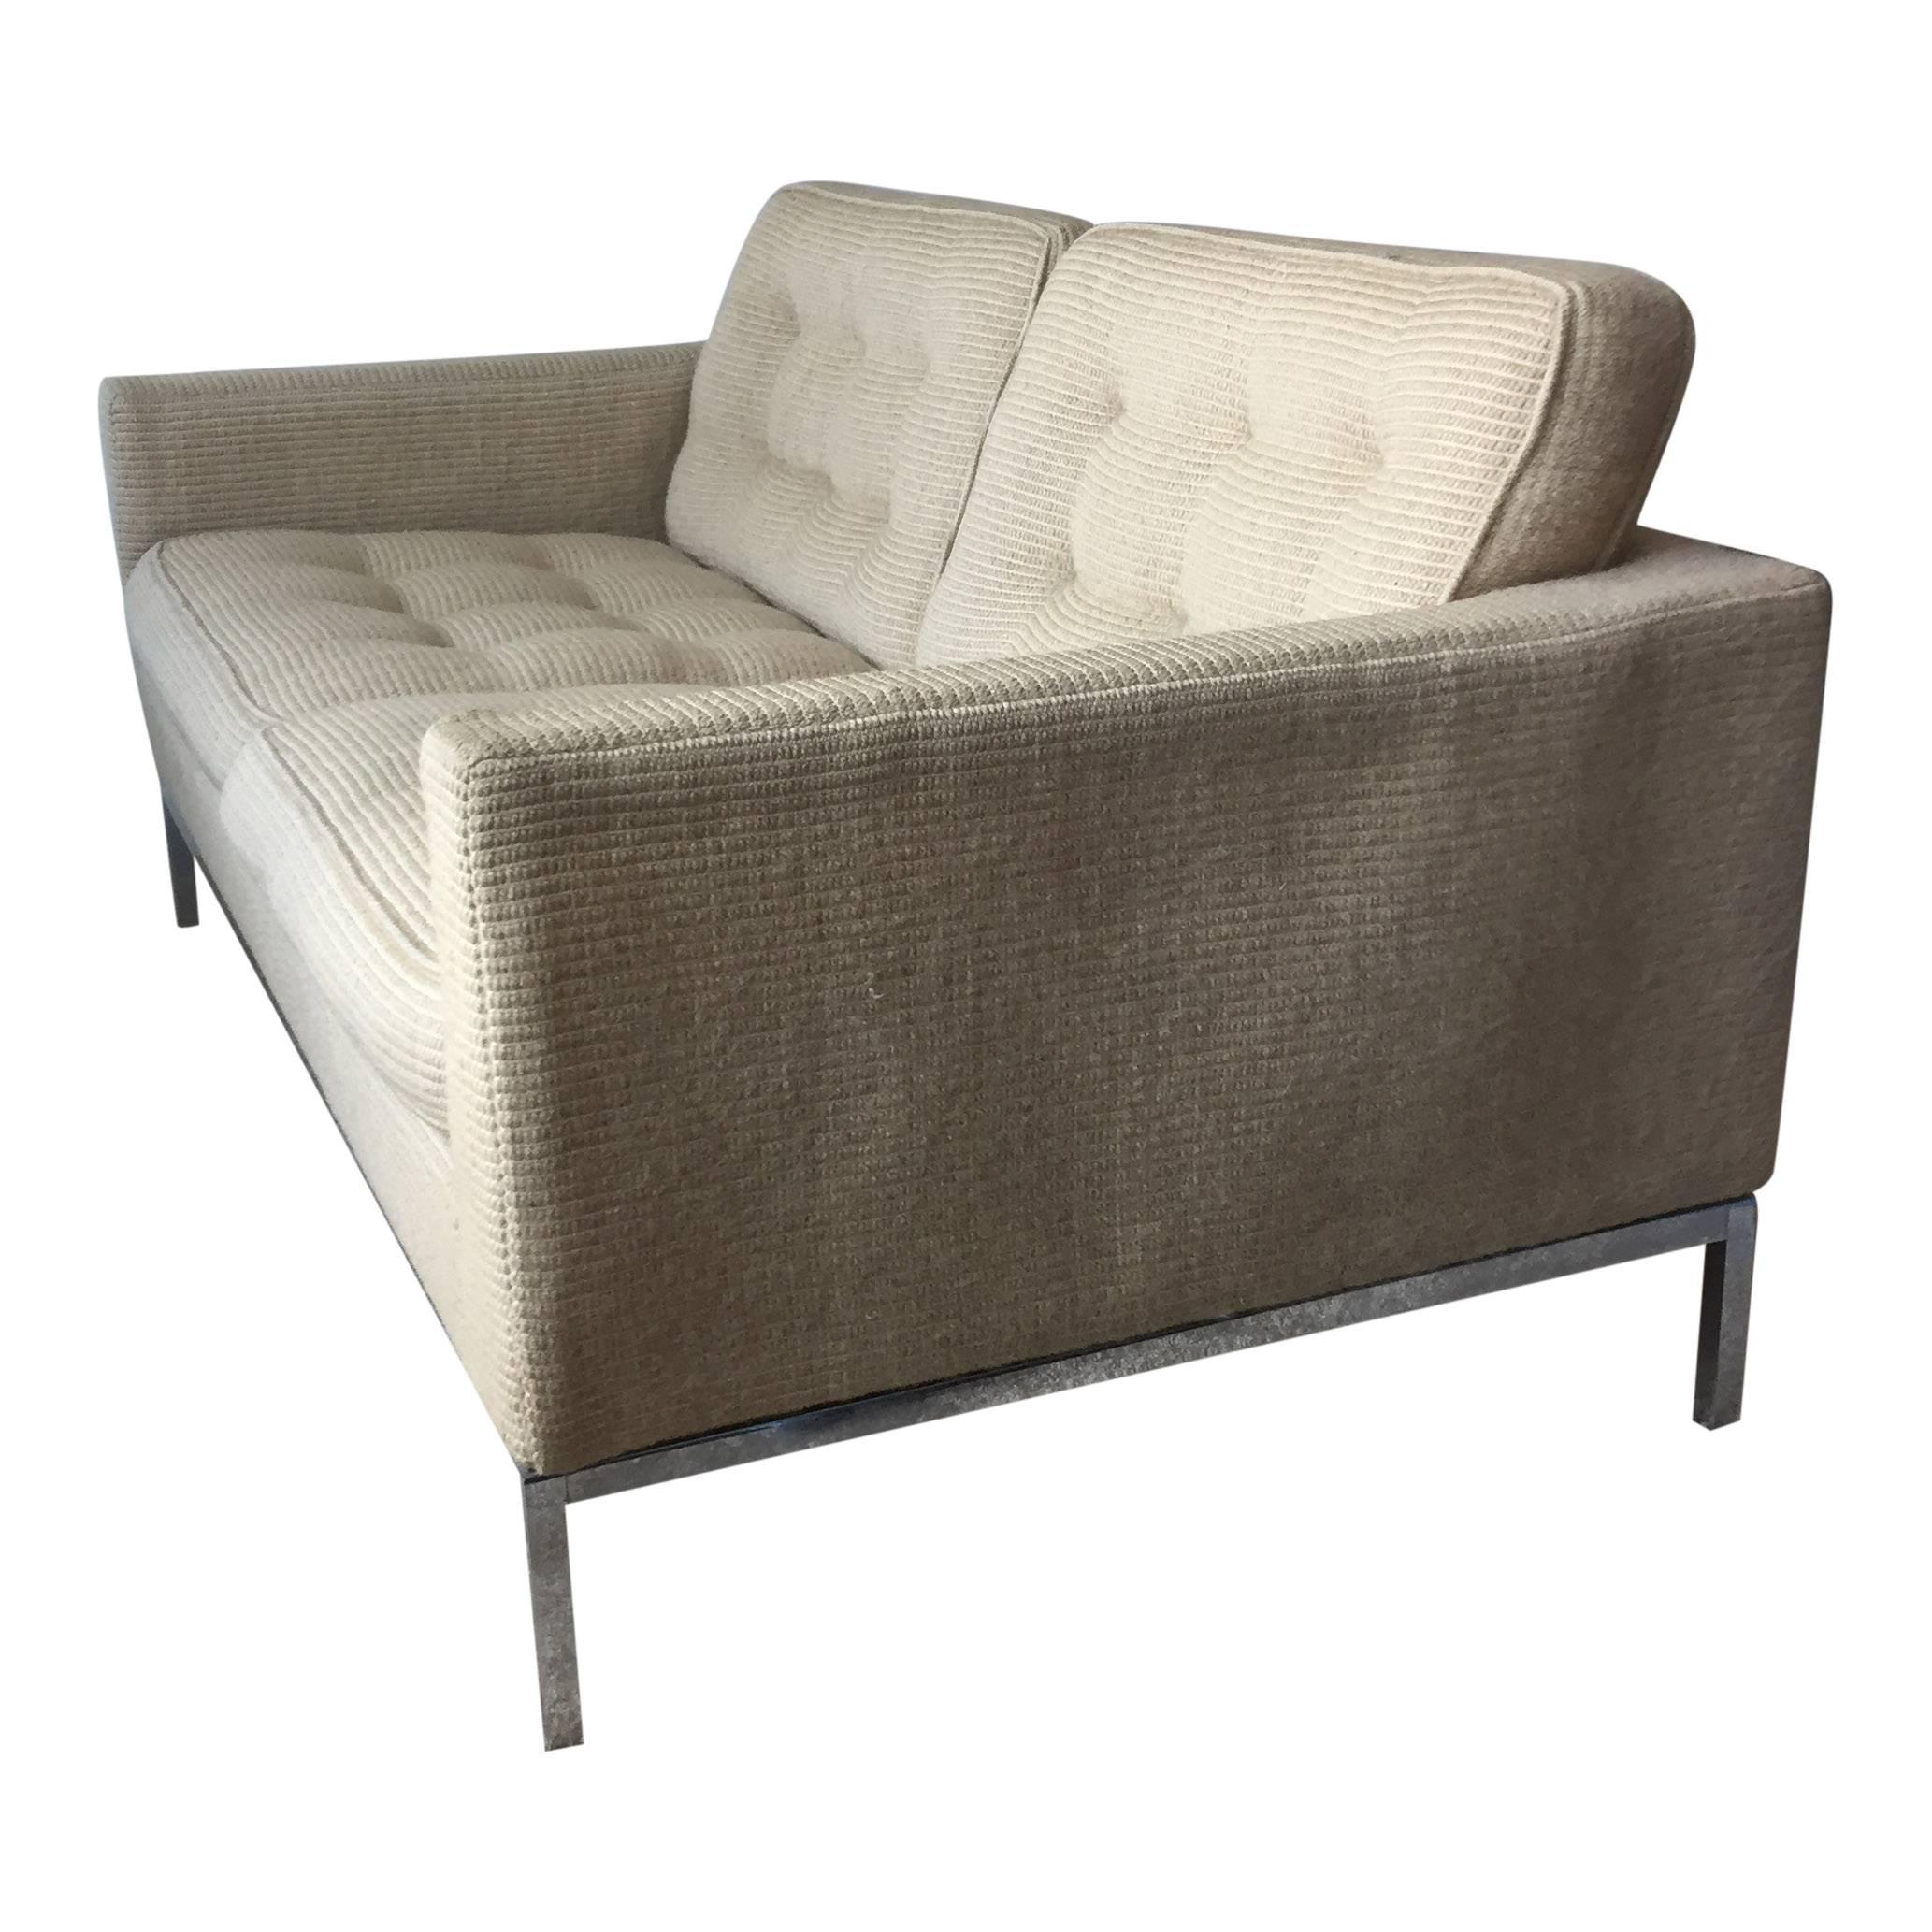 florence knoll for knoll associates midcentury loveseat sofa 1